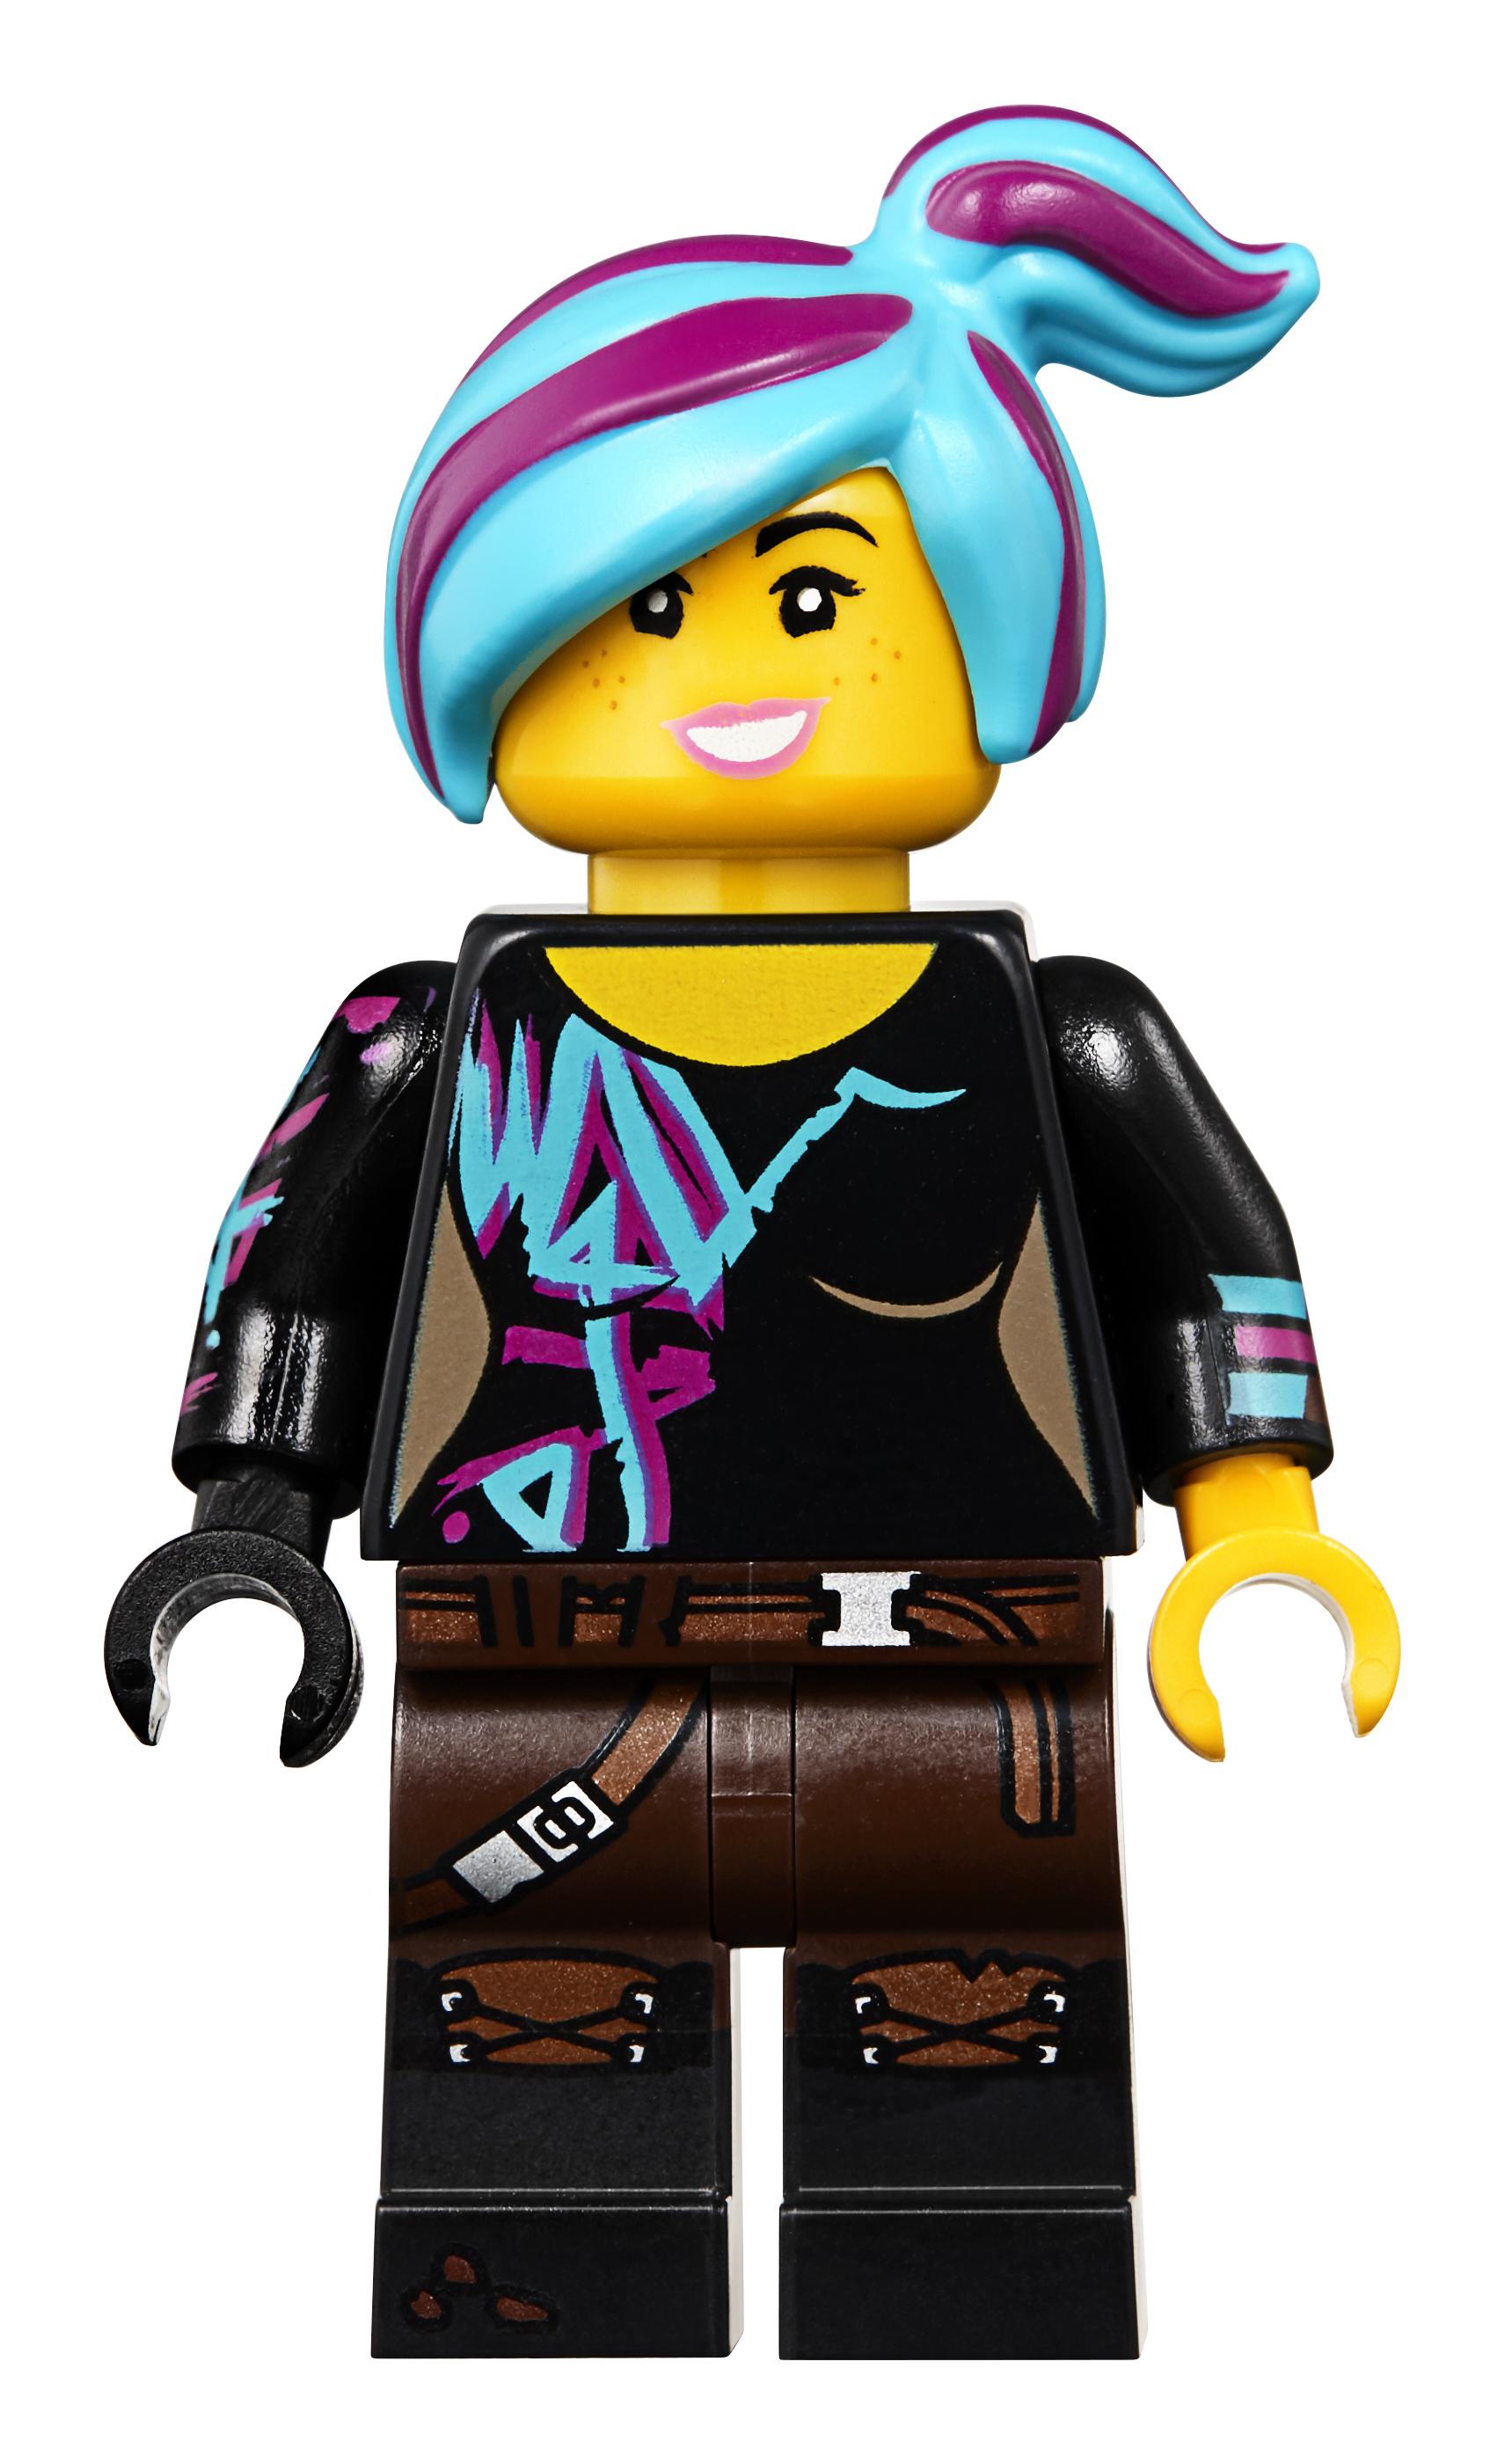 70838 Lego Movie-2 Minifigure CELESTE New